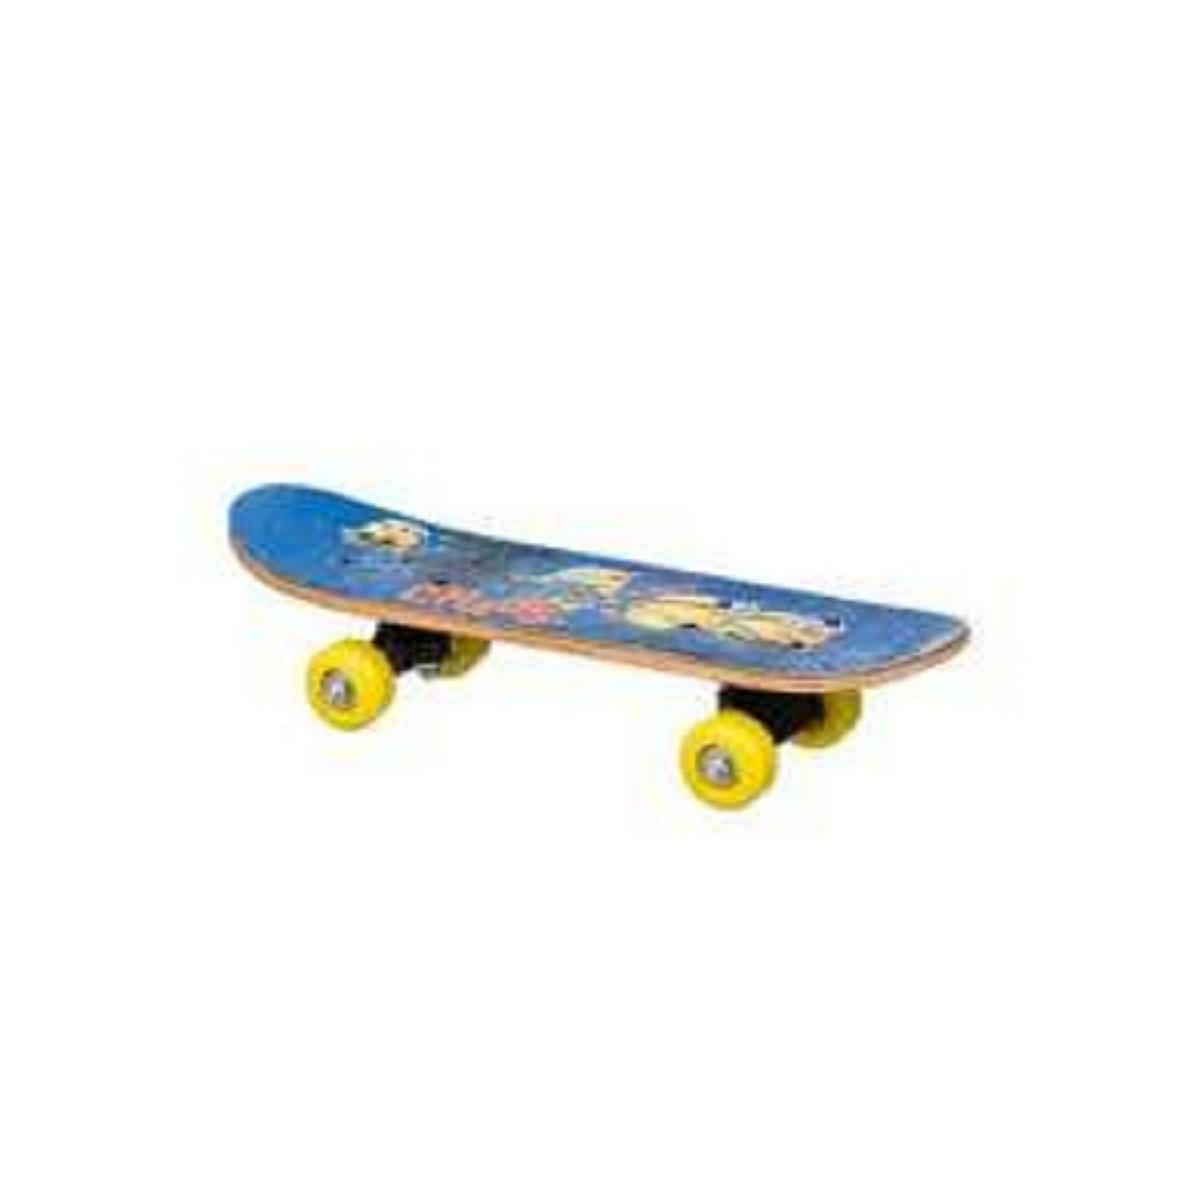 Kids Skate Board - Small